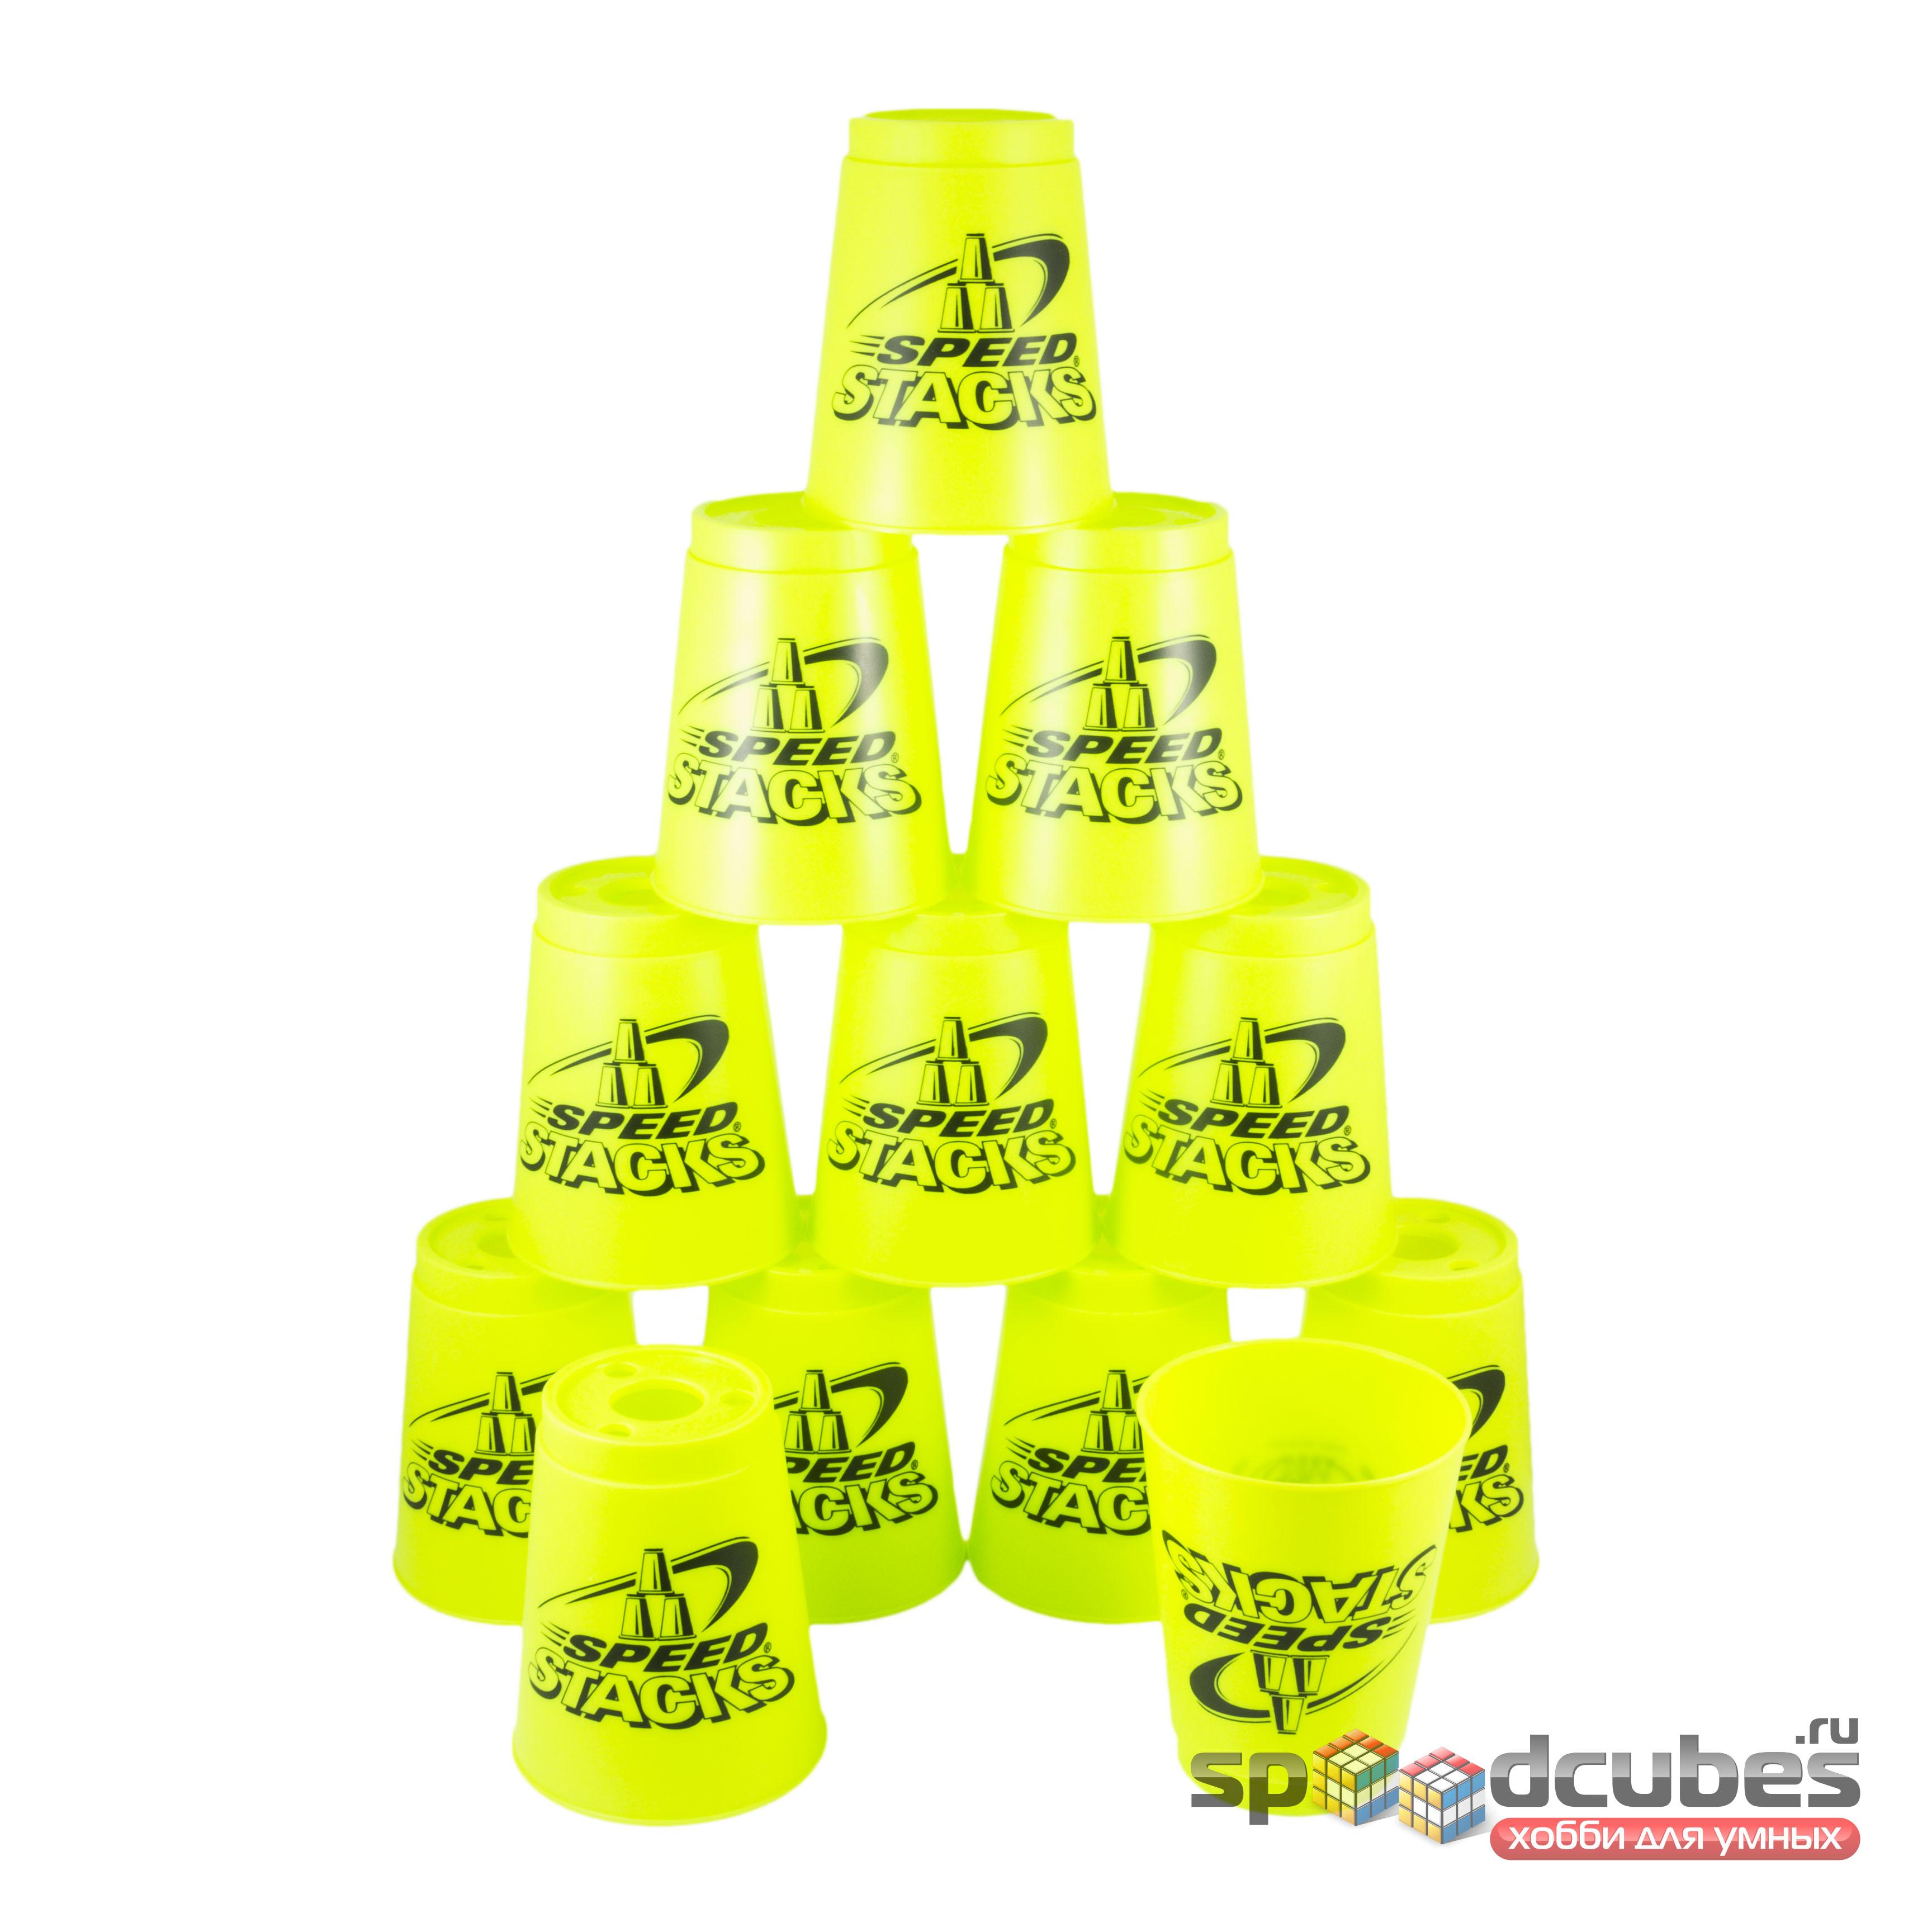 Speed Stacks стаканы для спидстакинга 1